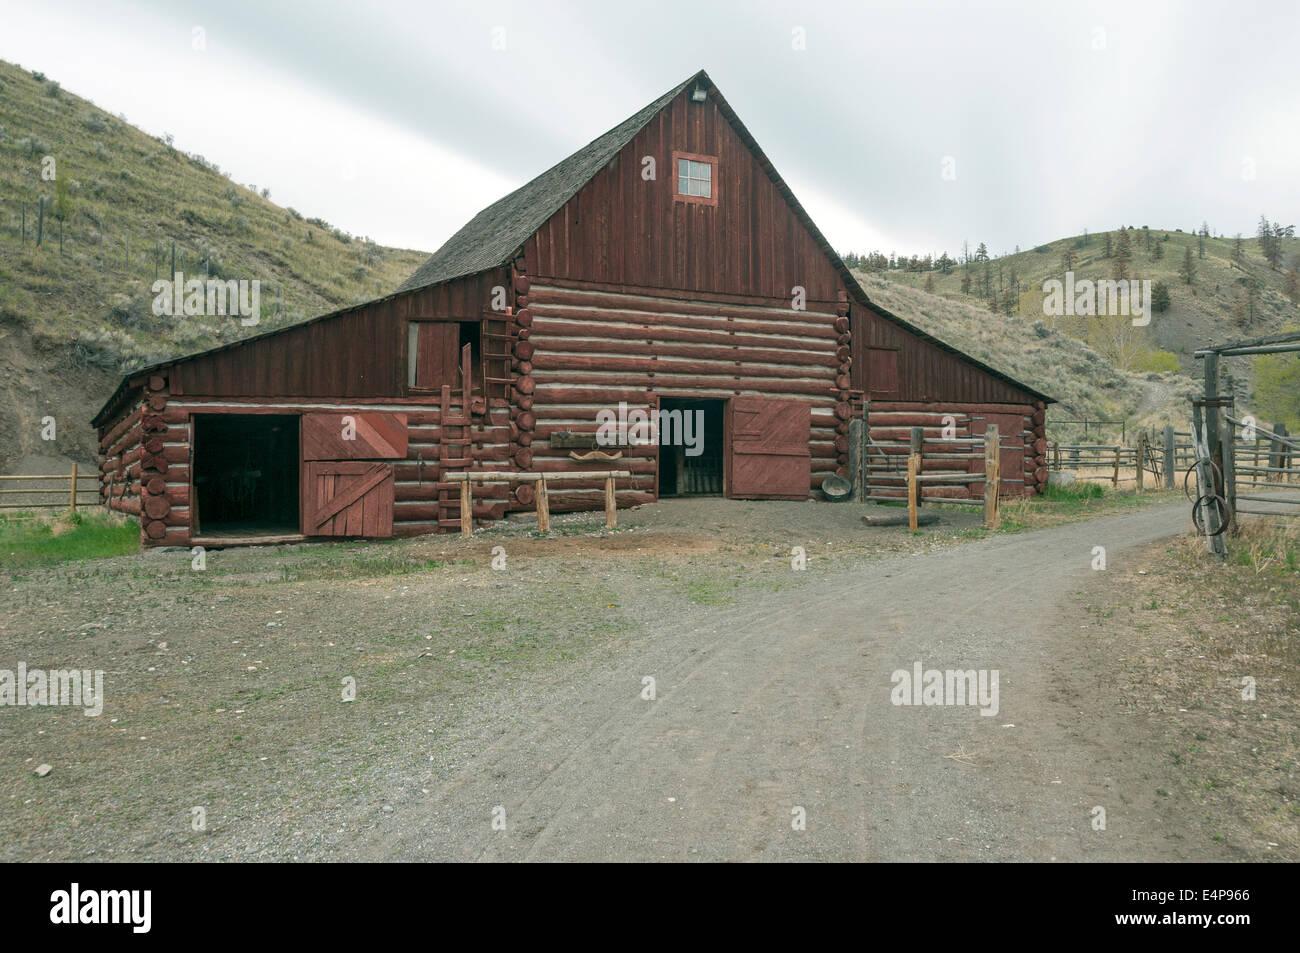 Elk203-3078 Canada, British Columbia, Historic Hat Creek Ranch, barn - Stock Image